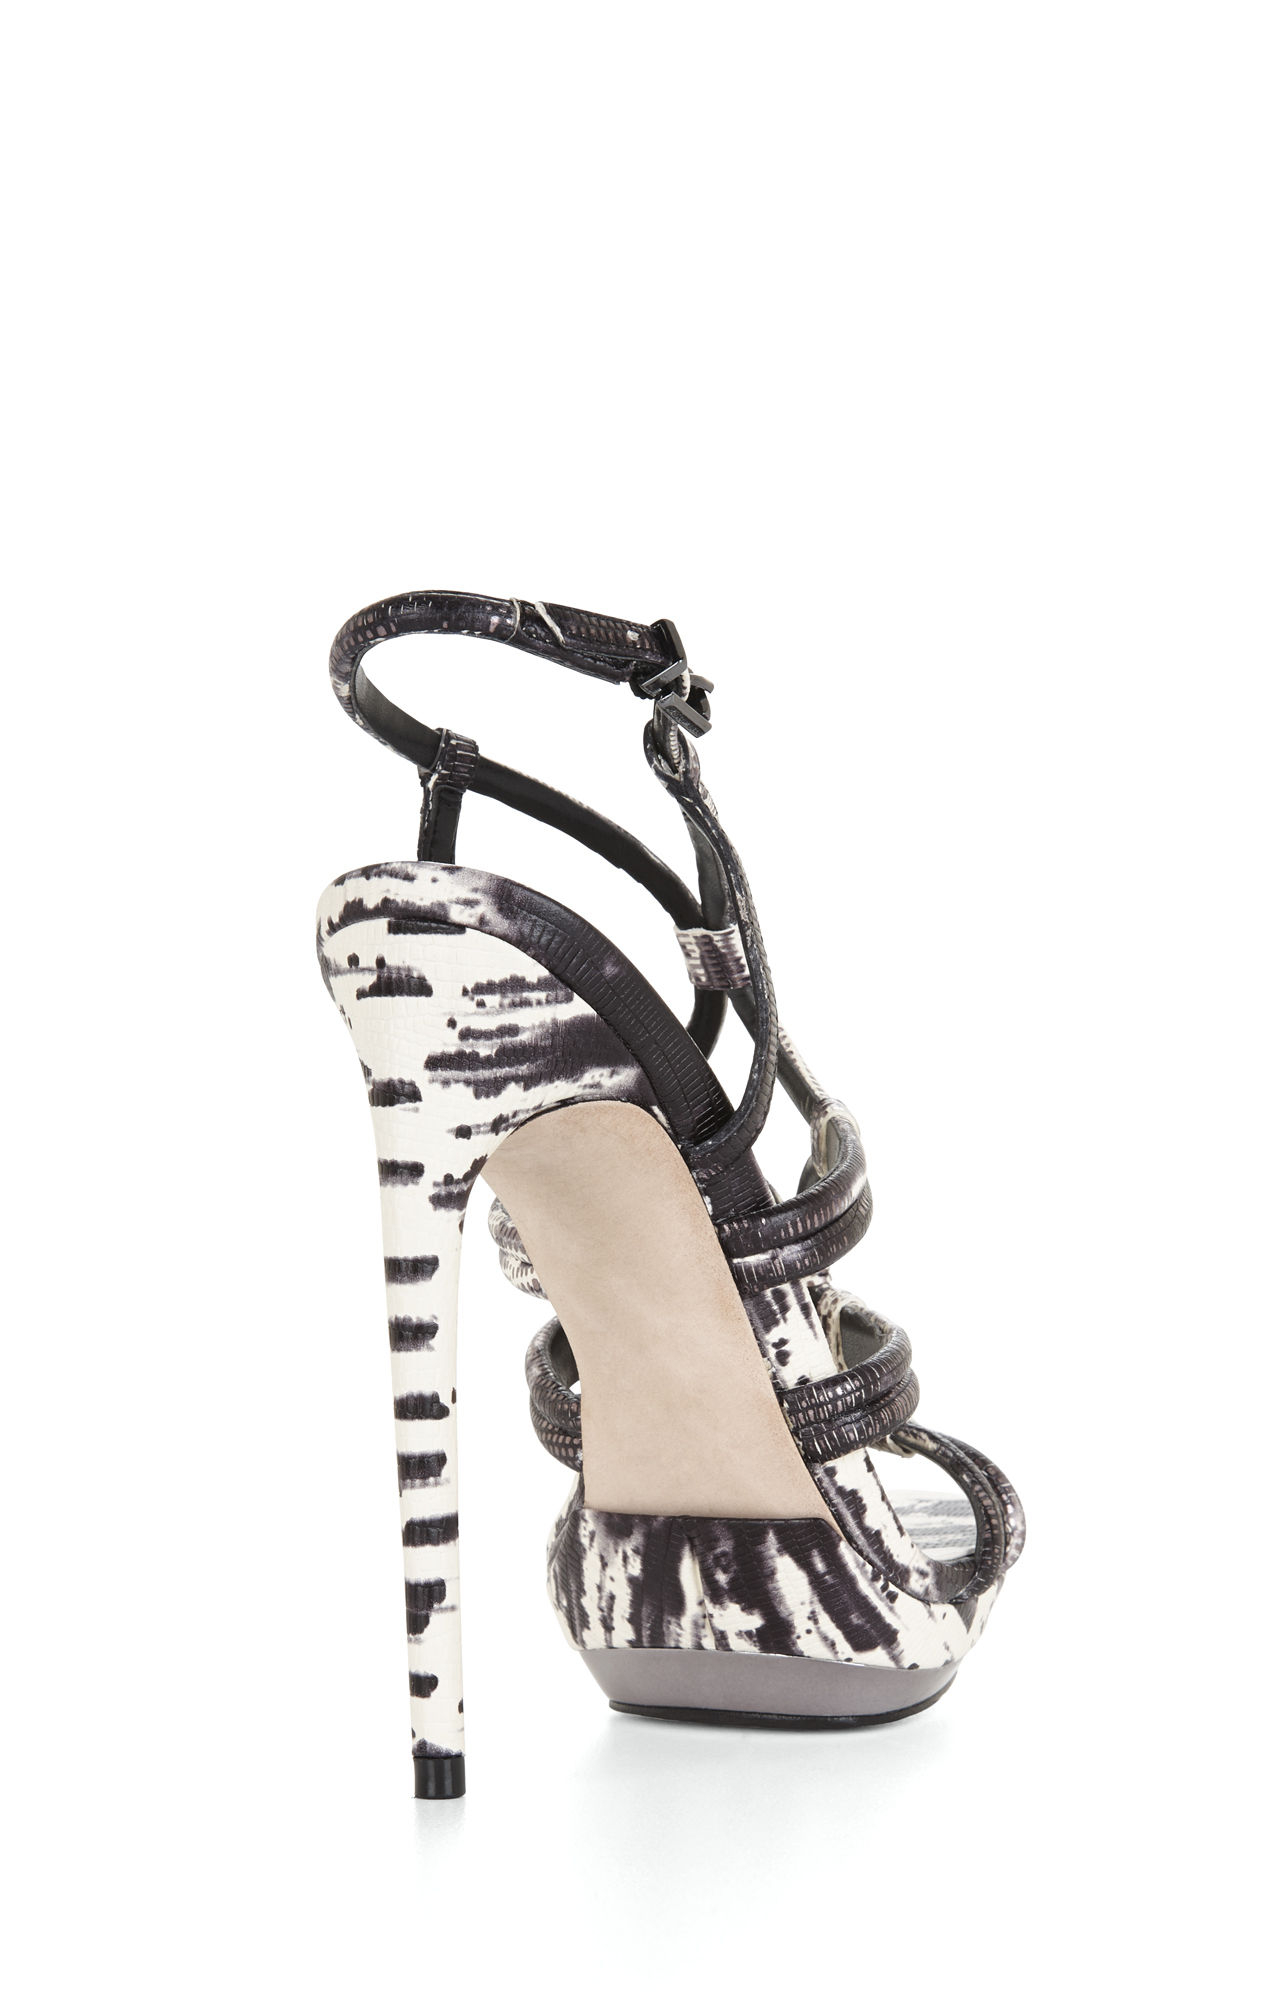 c4a0706d76da2e Lyst - Bcbgmaxazria Farrow Highheel Strappy Dress Sandal in Black